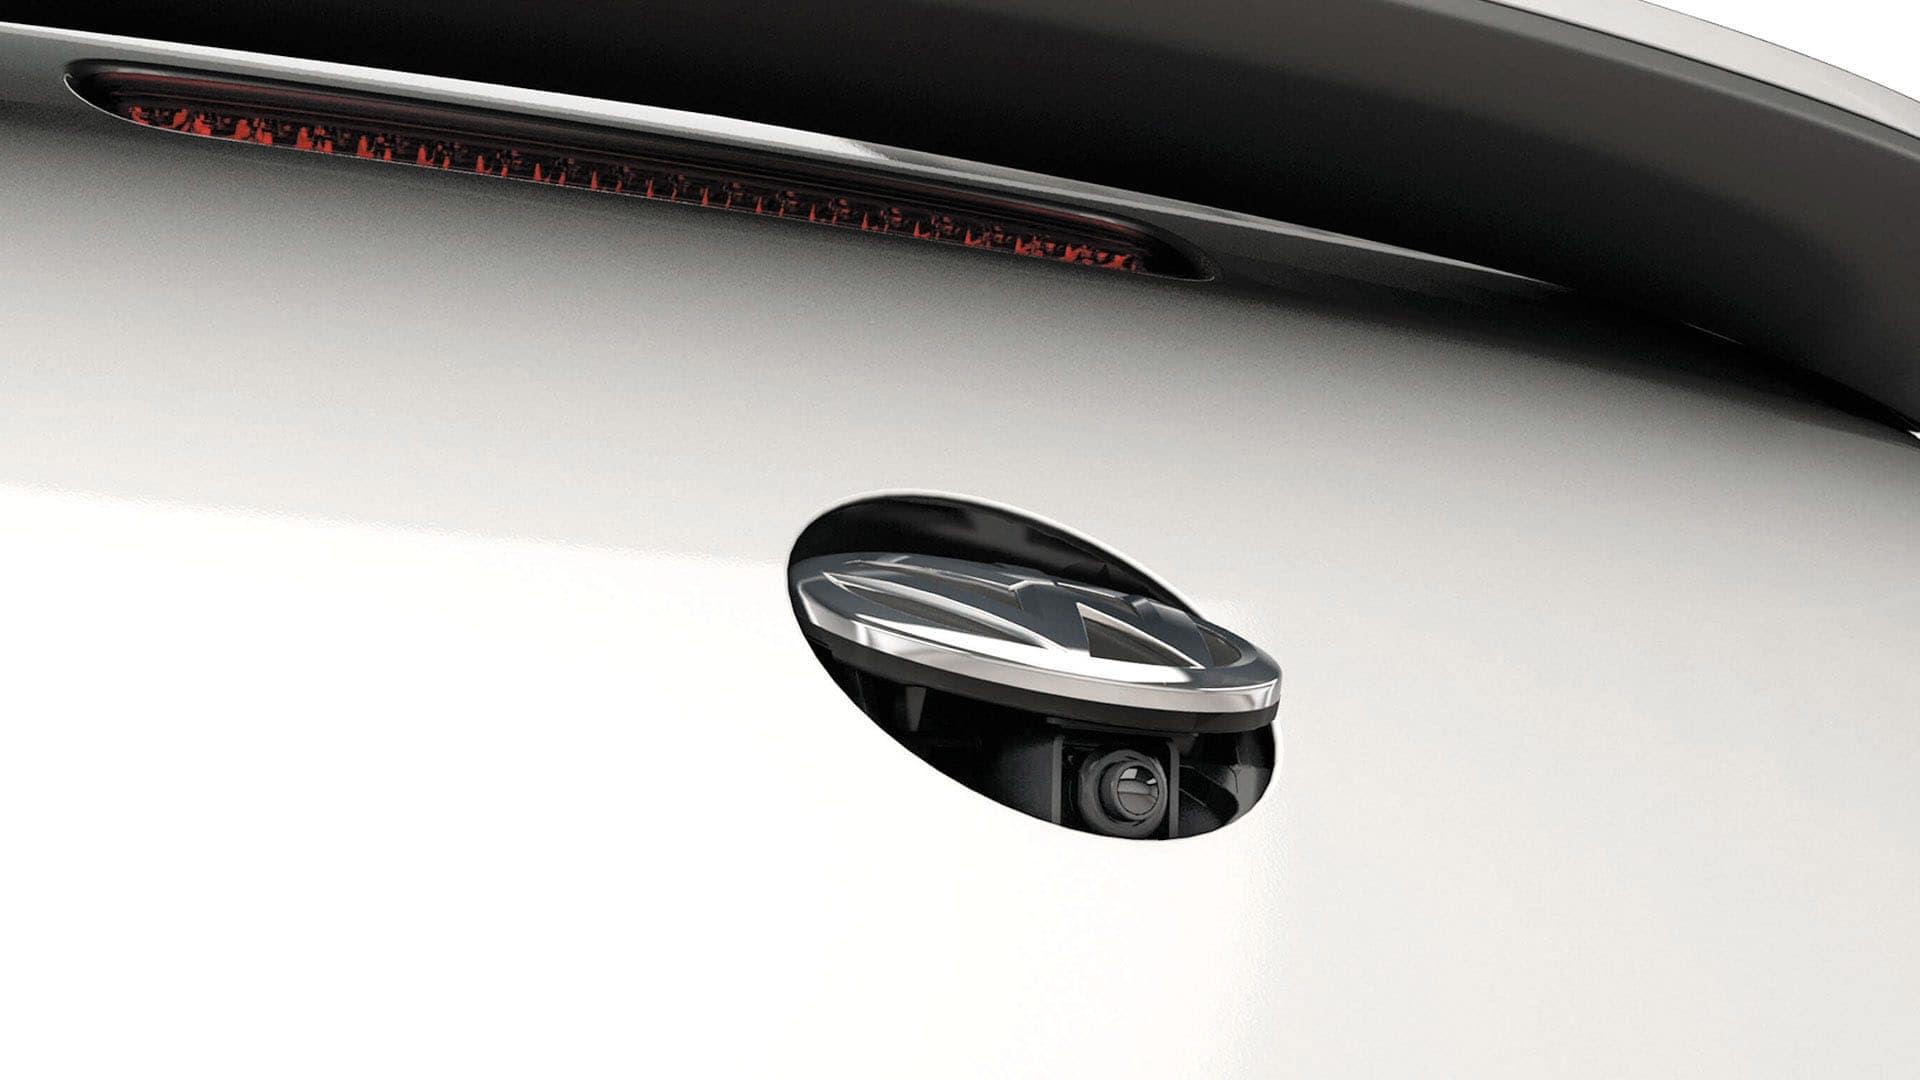 2019 VW Beetle rearview camera